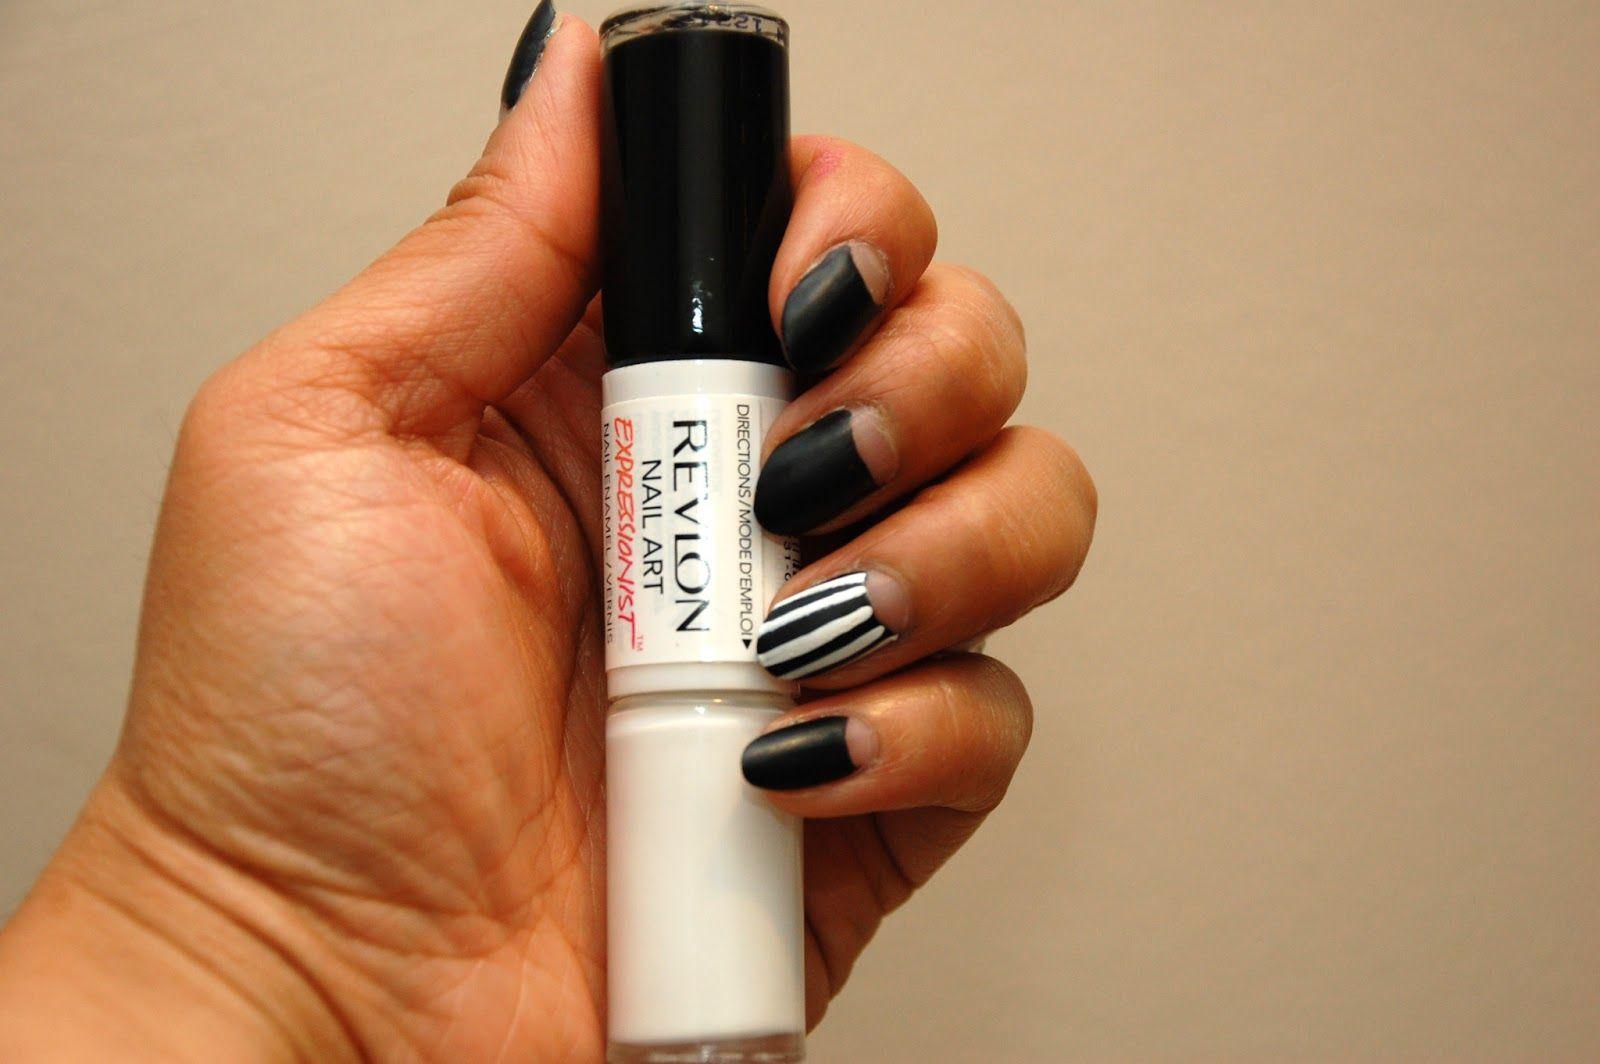 Revlon Nail Art dual polish. BN, $6.00 shipped. Paid 9.50 originally.